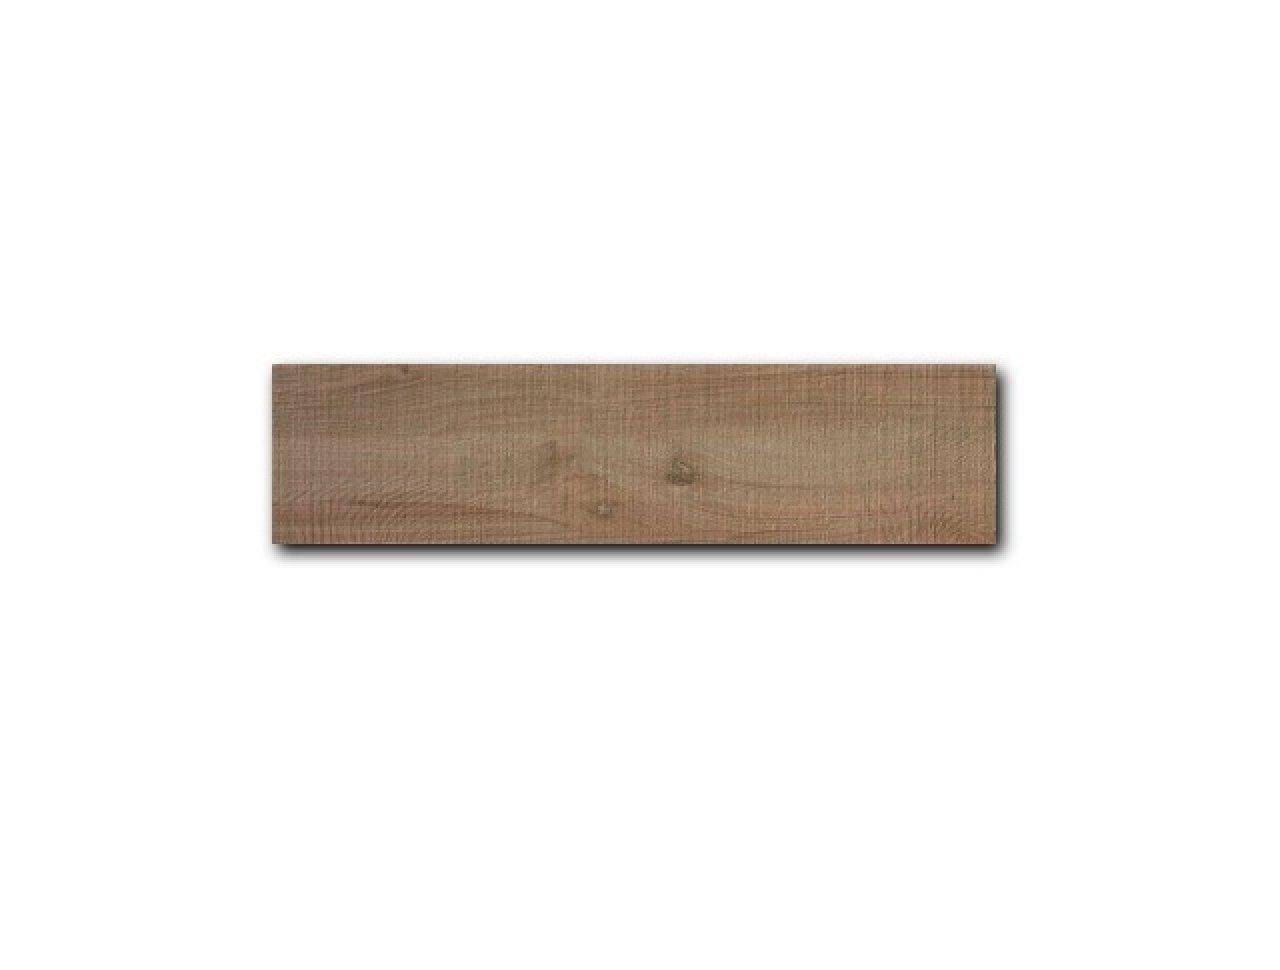 Напольная плитка Etic Noce Ret. 22.5x90